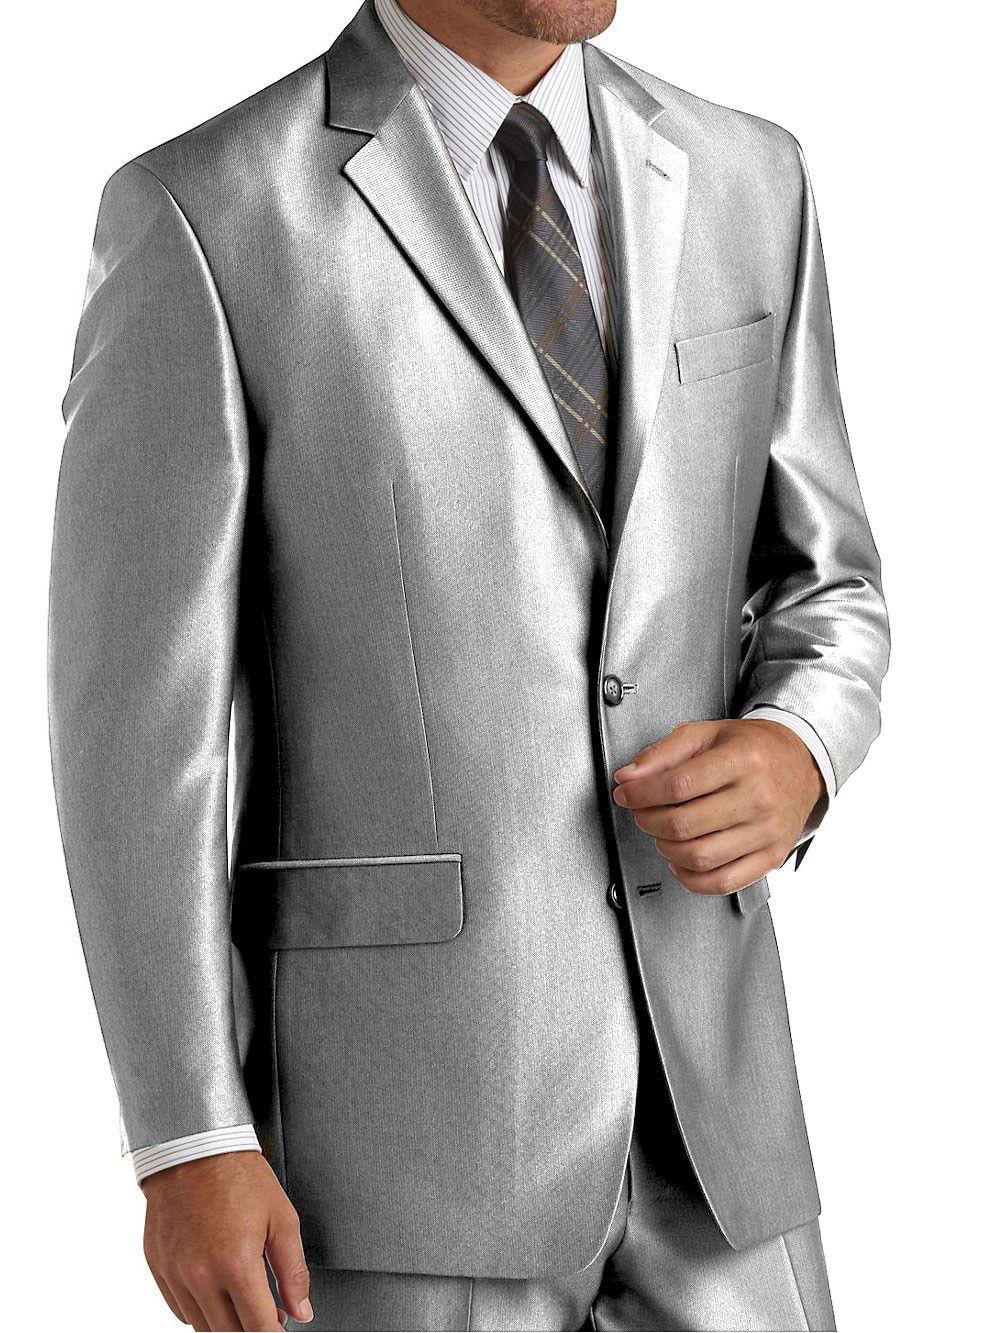 costume homme gris 2 boutons shinypas cher kebello. Black Bedroom Furniture Sets. Home Design Ideas